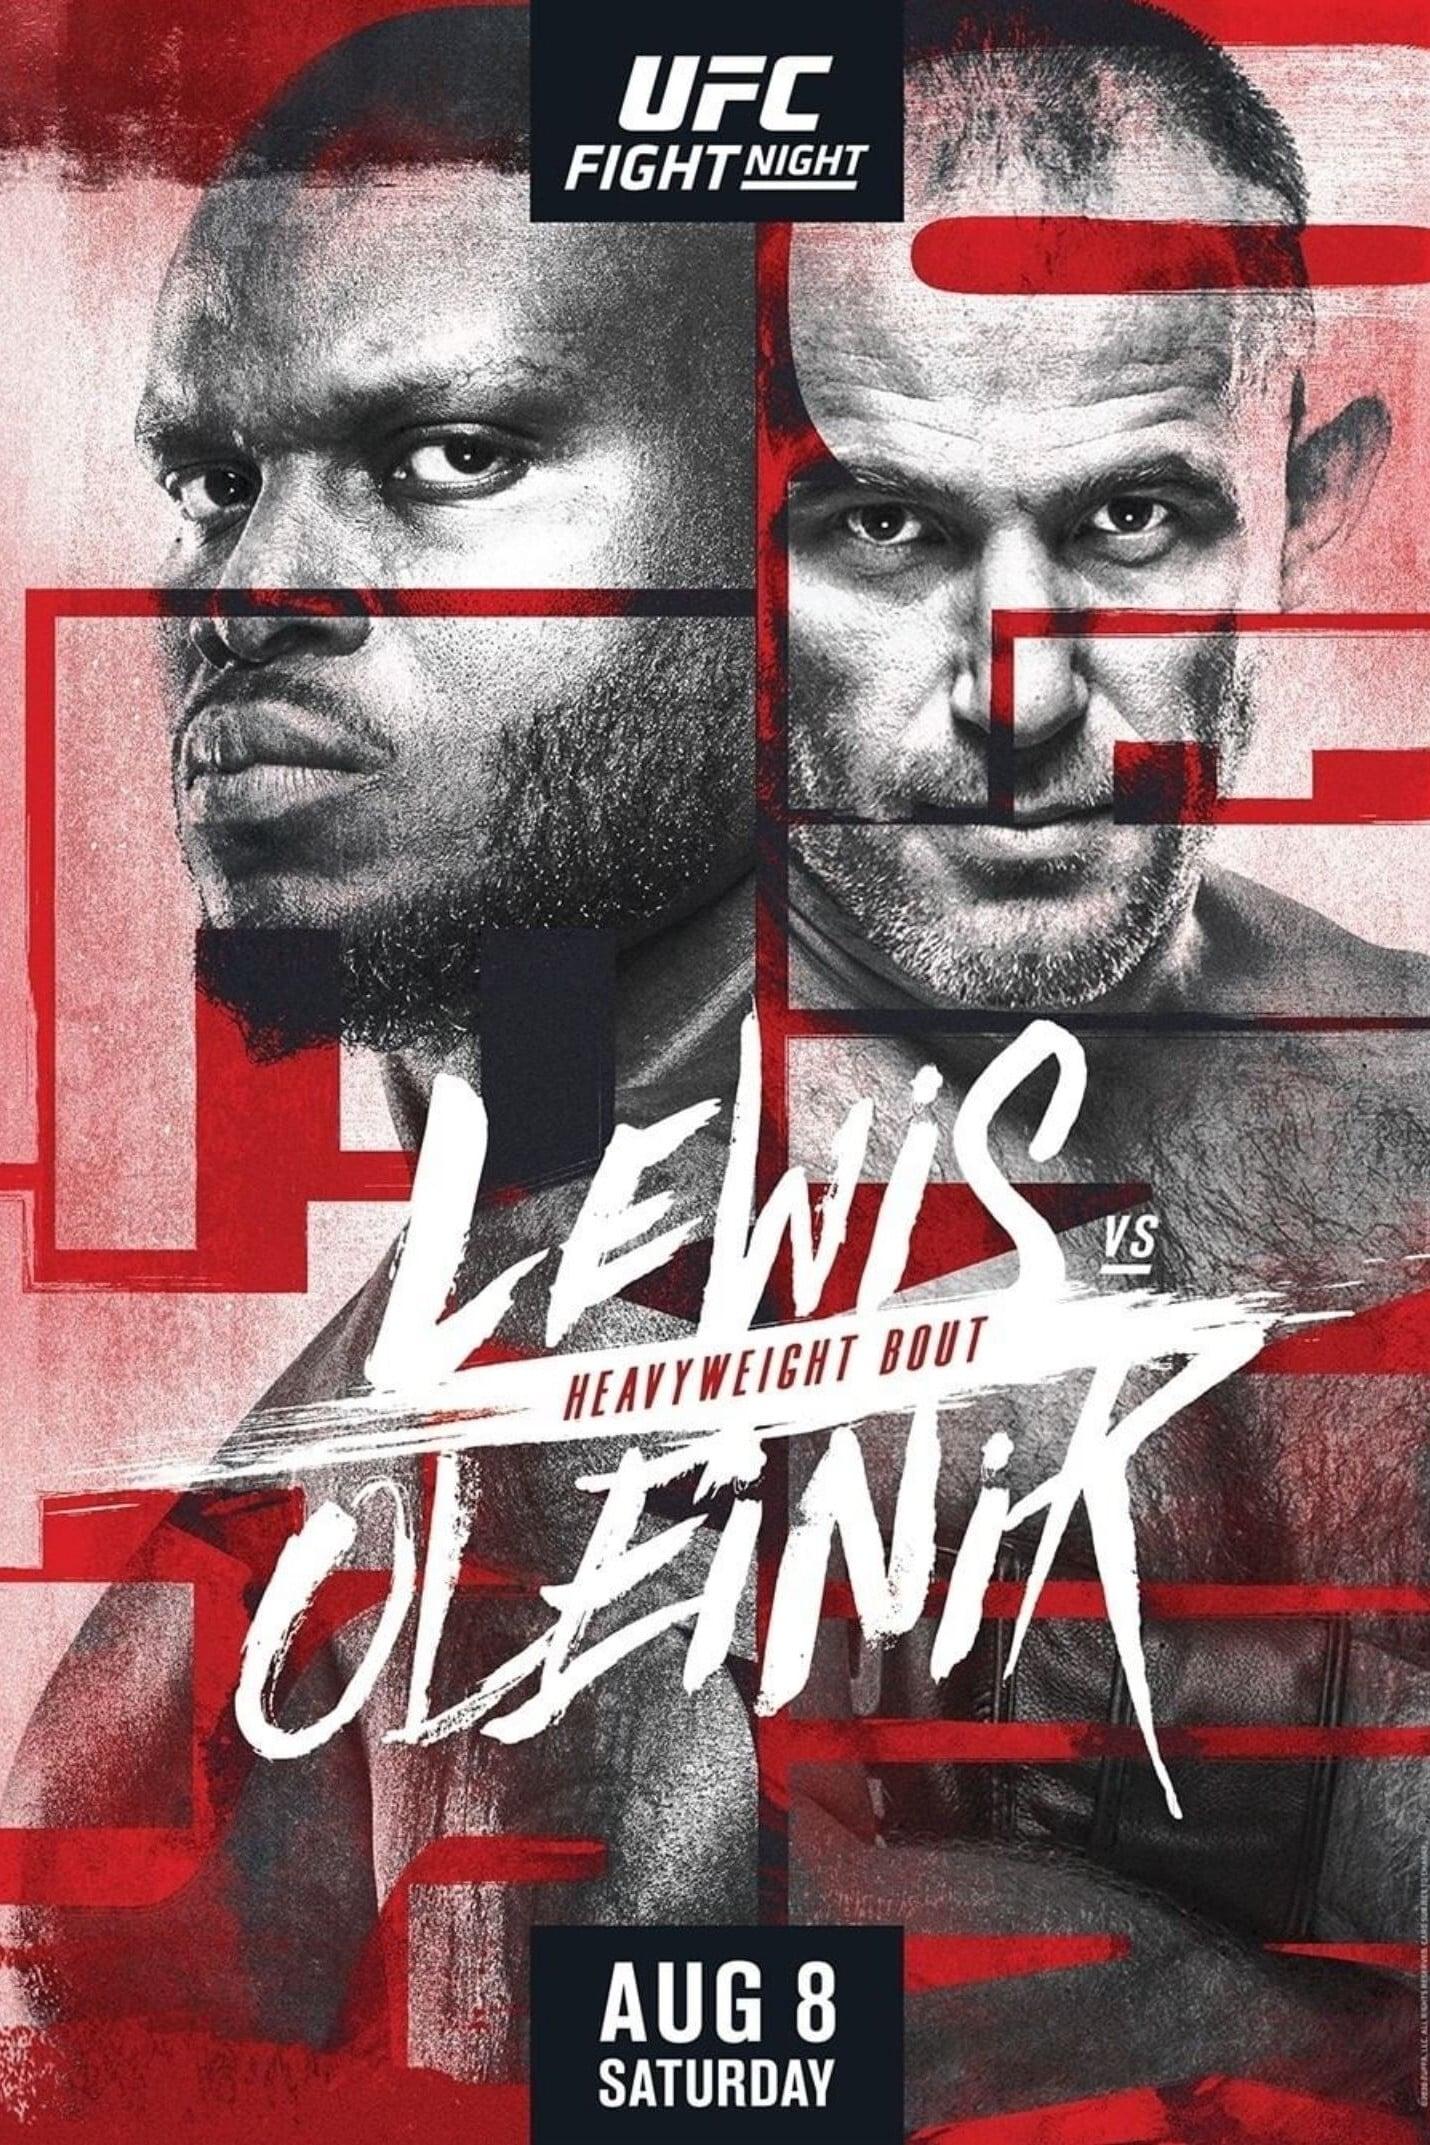 UFC Fight Night 174: Lewis vs. Oleinik